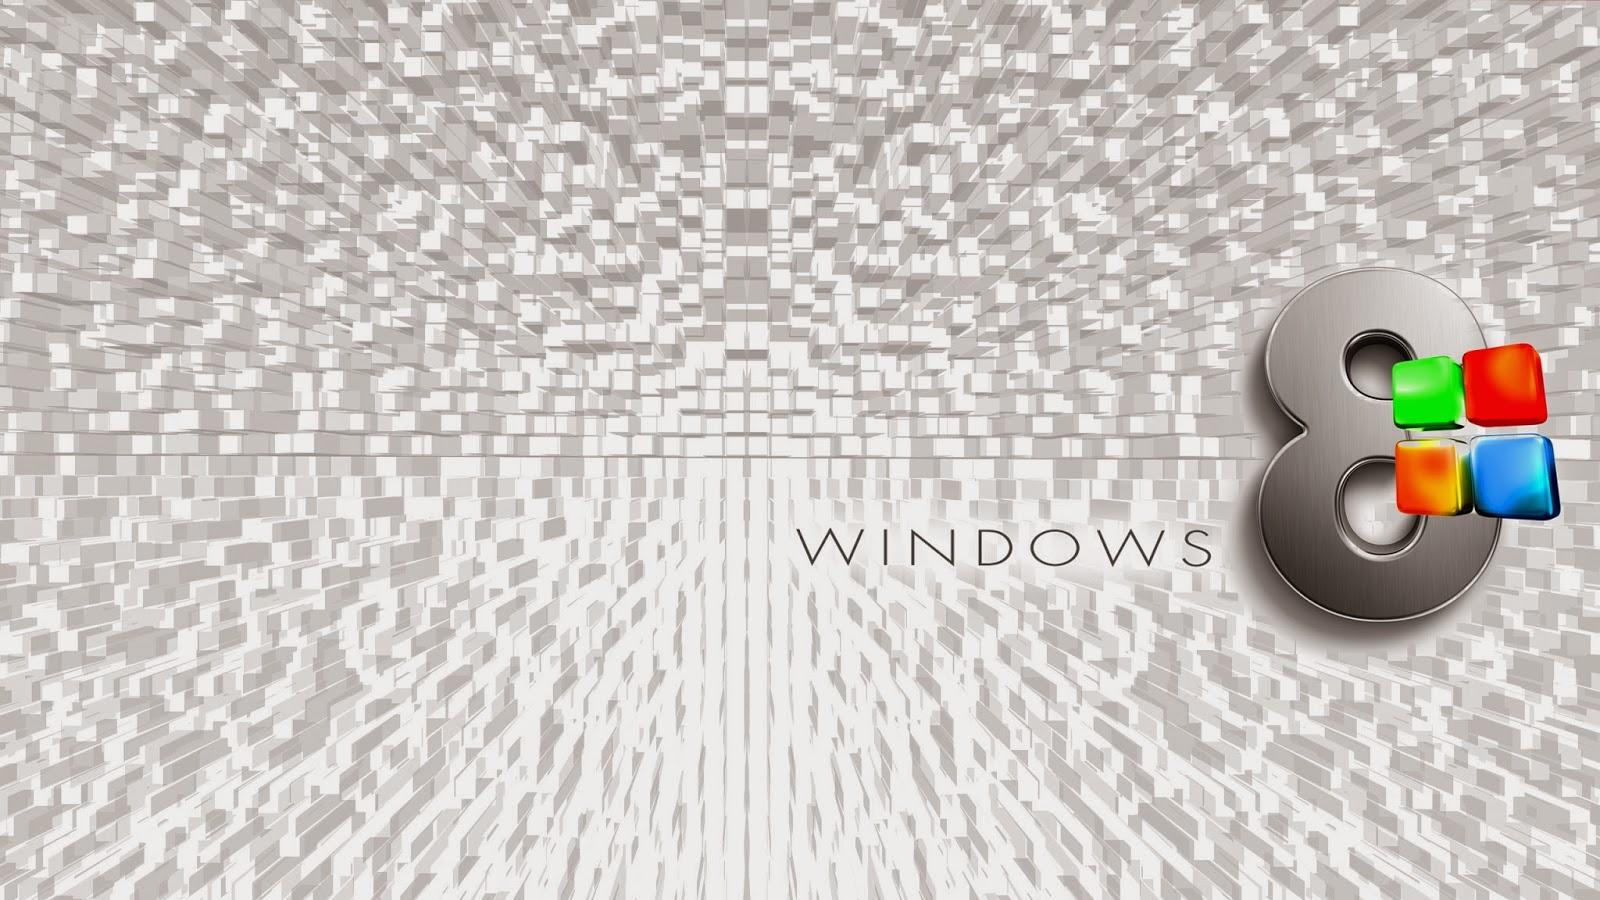 windows-8-3d-text-wallpaper-white-ash-BG-theme-High-definition-wallpaper.jpg